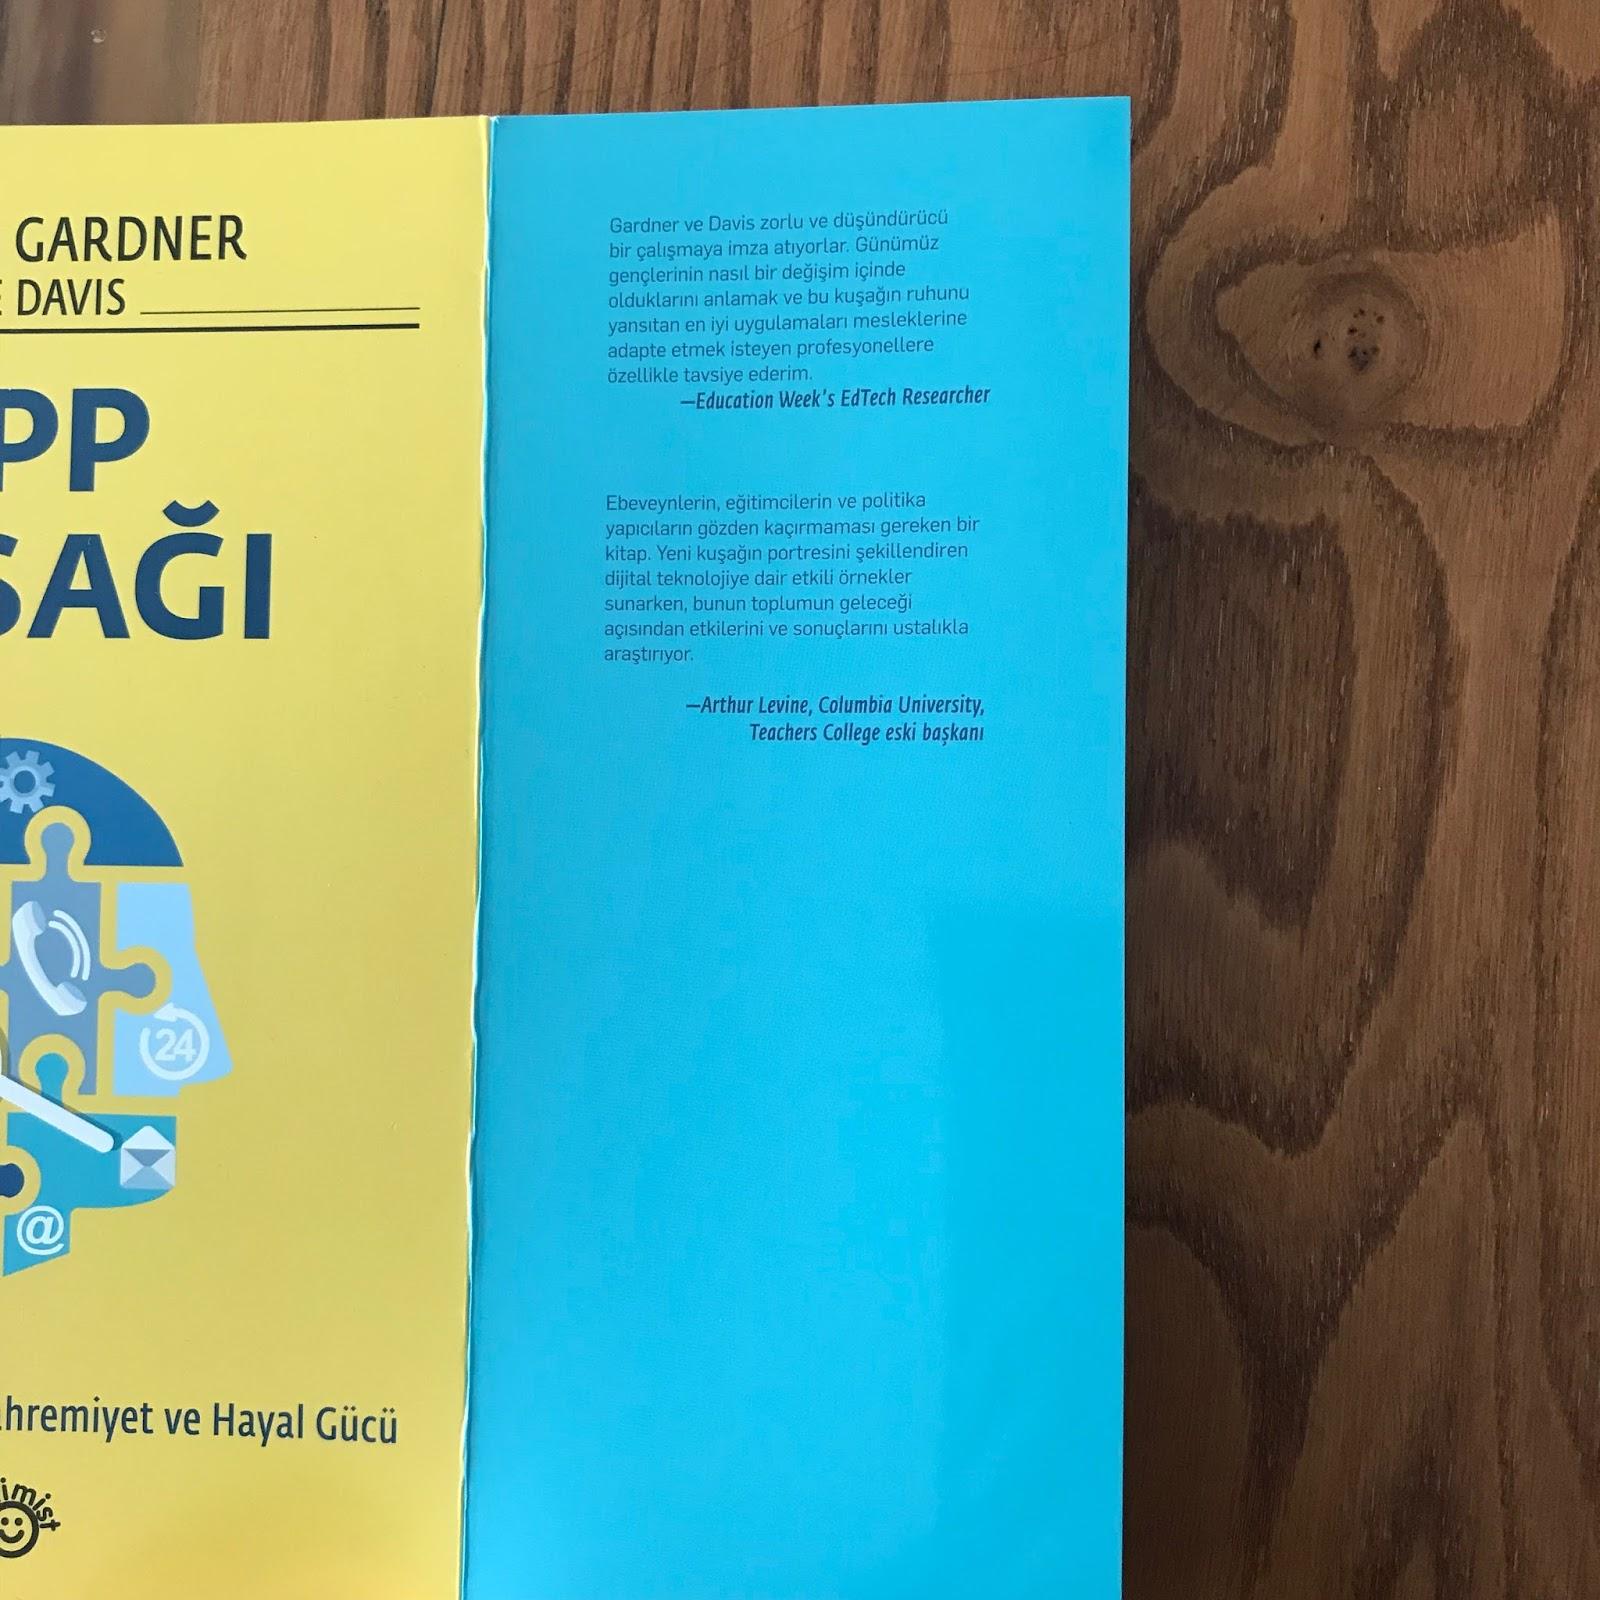 APP Kusagi - Dijital Dunyada Kimlik, Mahremiyet ve Hayal Gucu (Kitap)